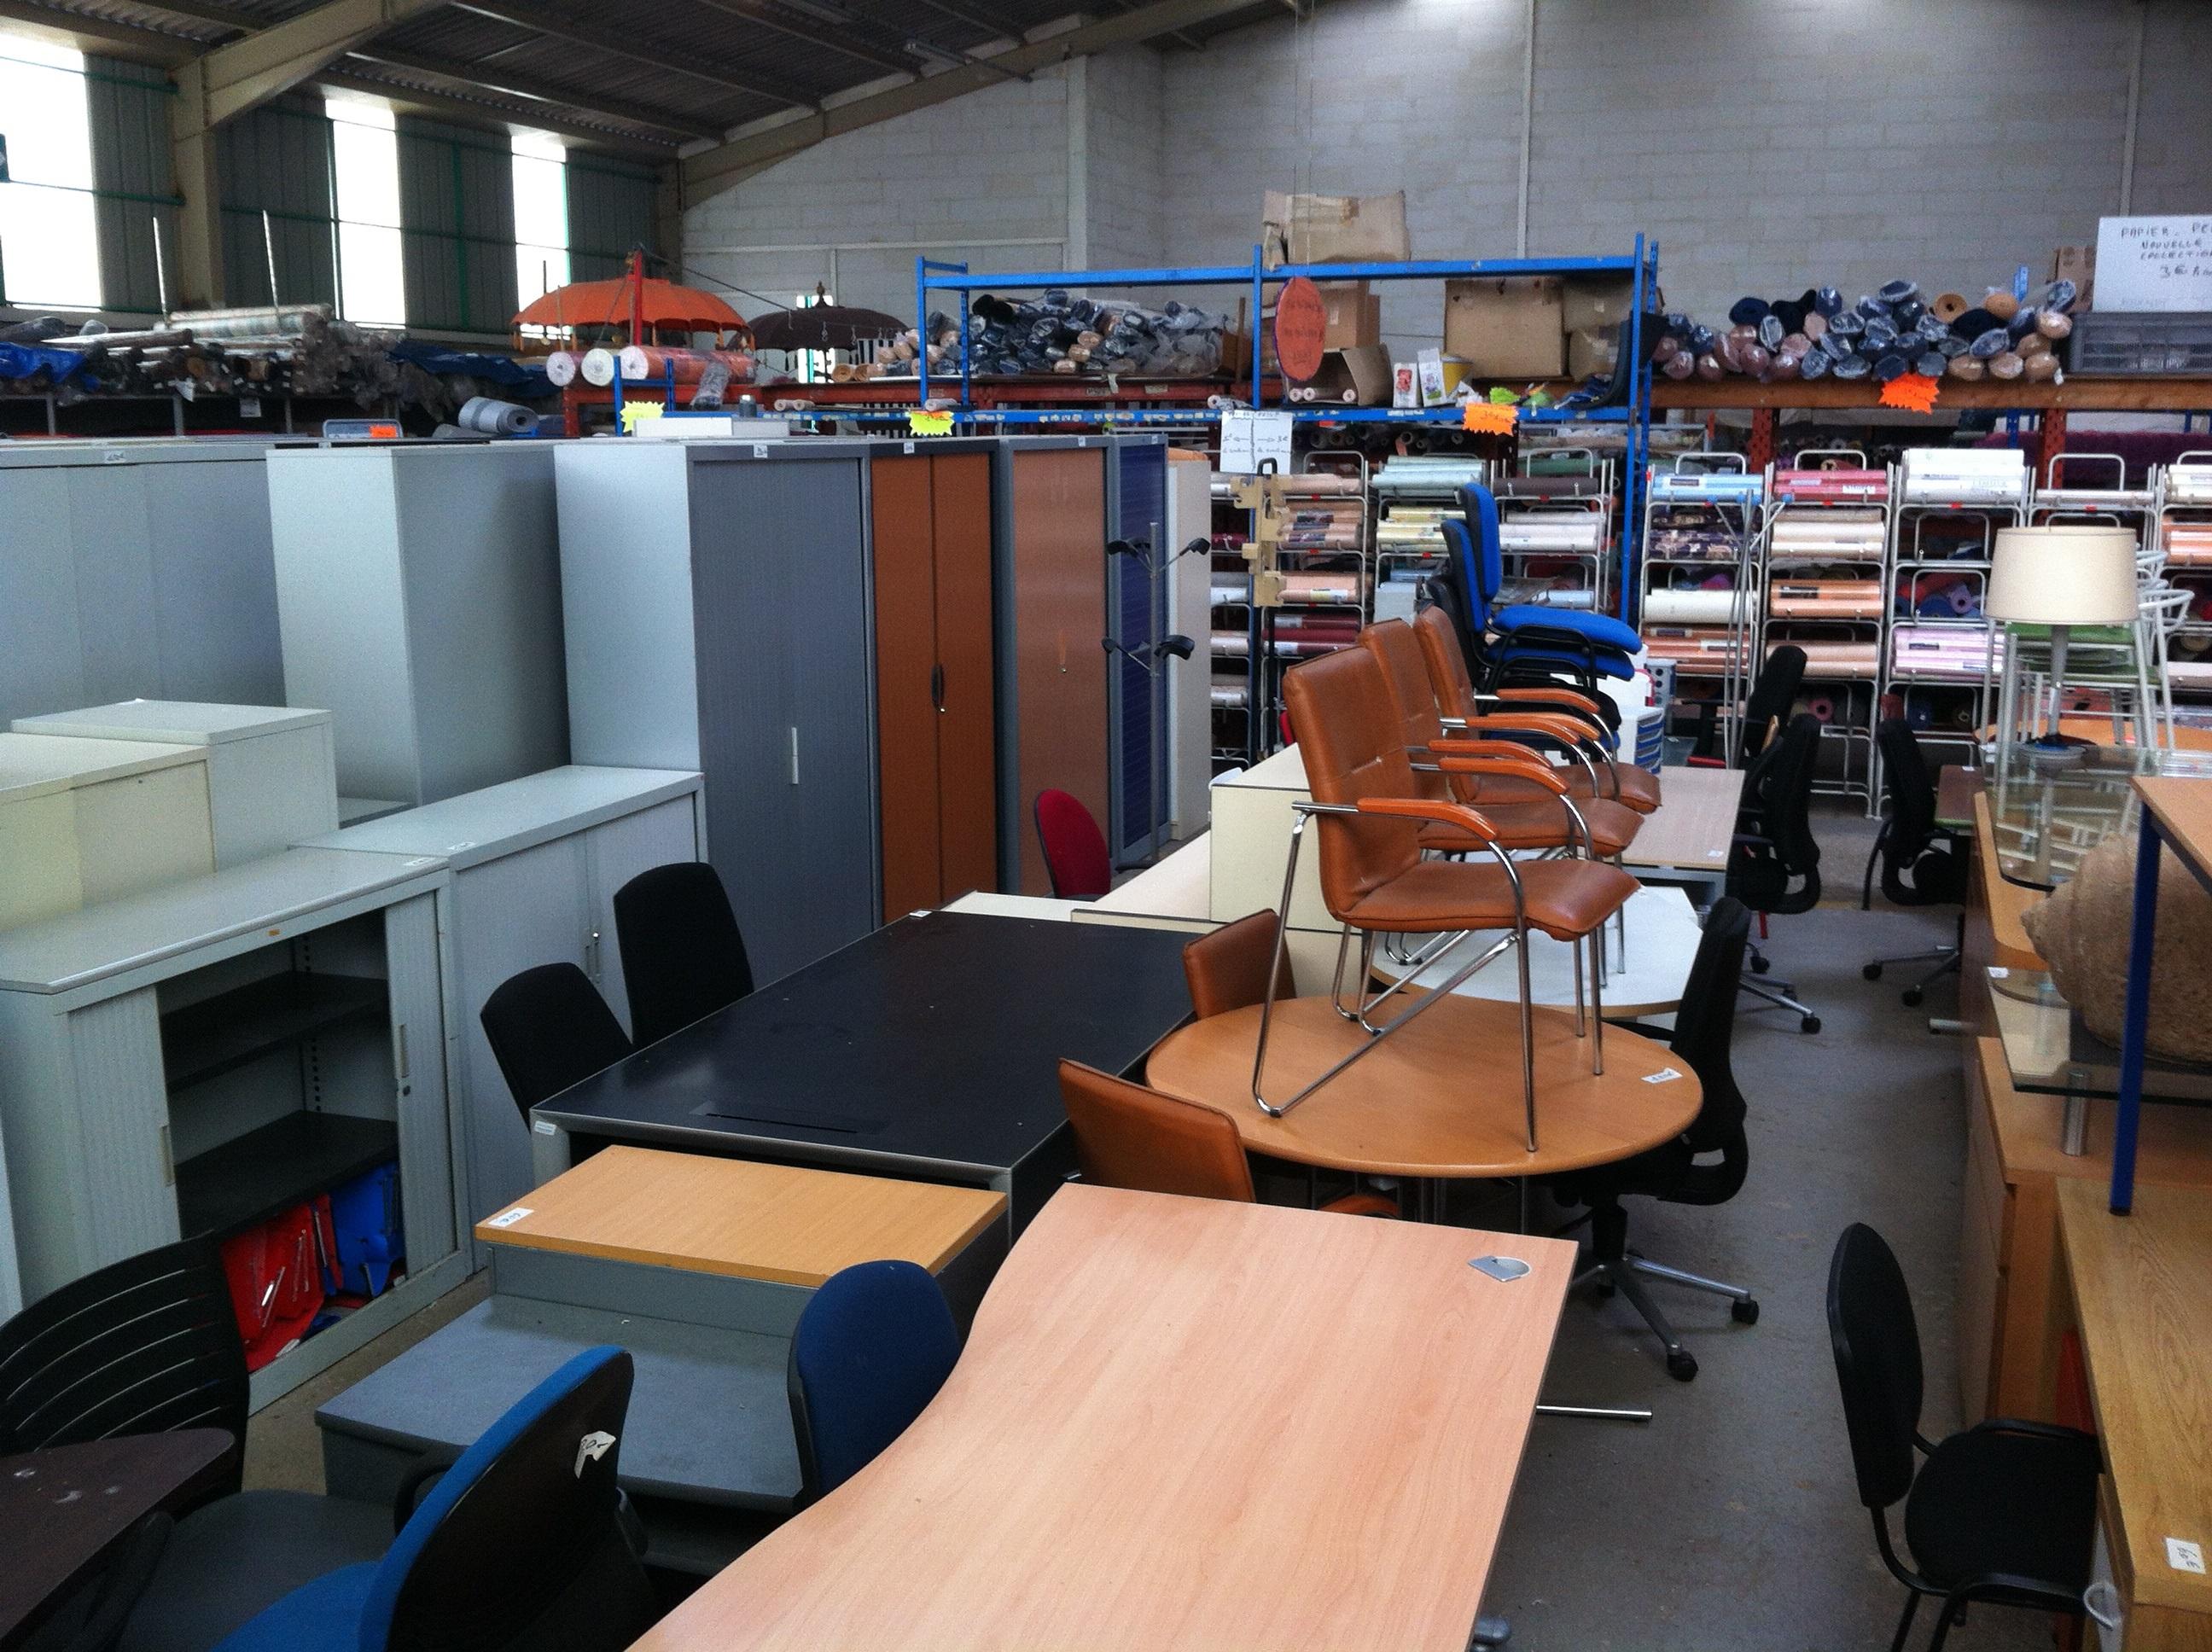 Bgf 61 brocante industrielle de glos la ferri re mobilier de bureau - La brocante industrielle ...